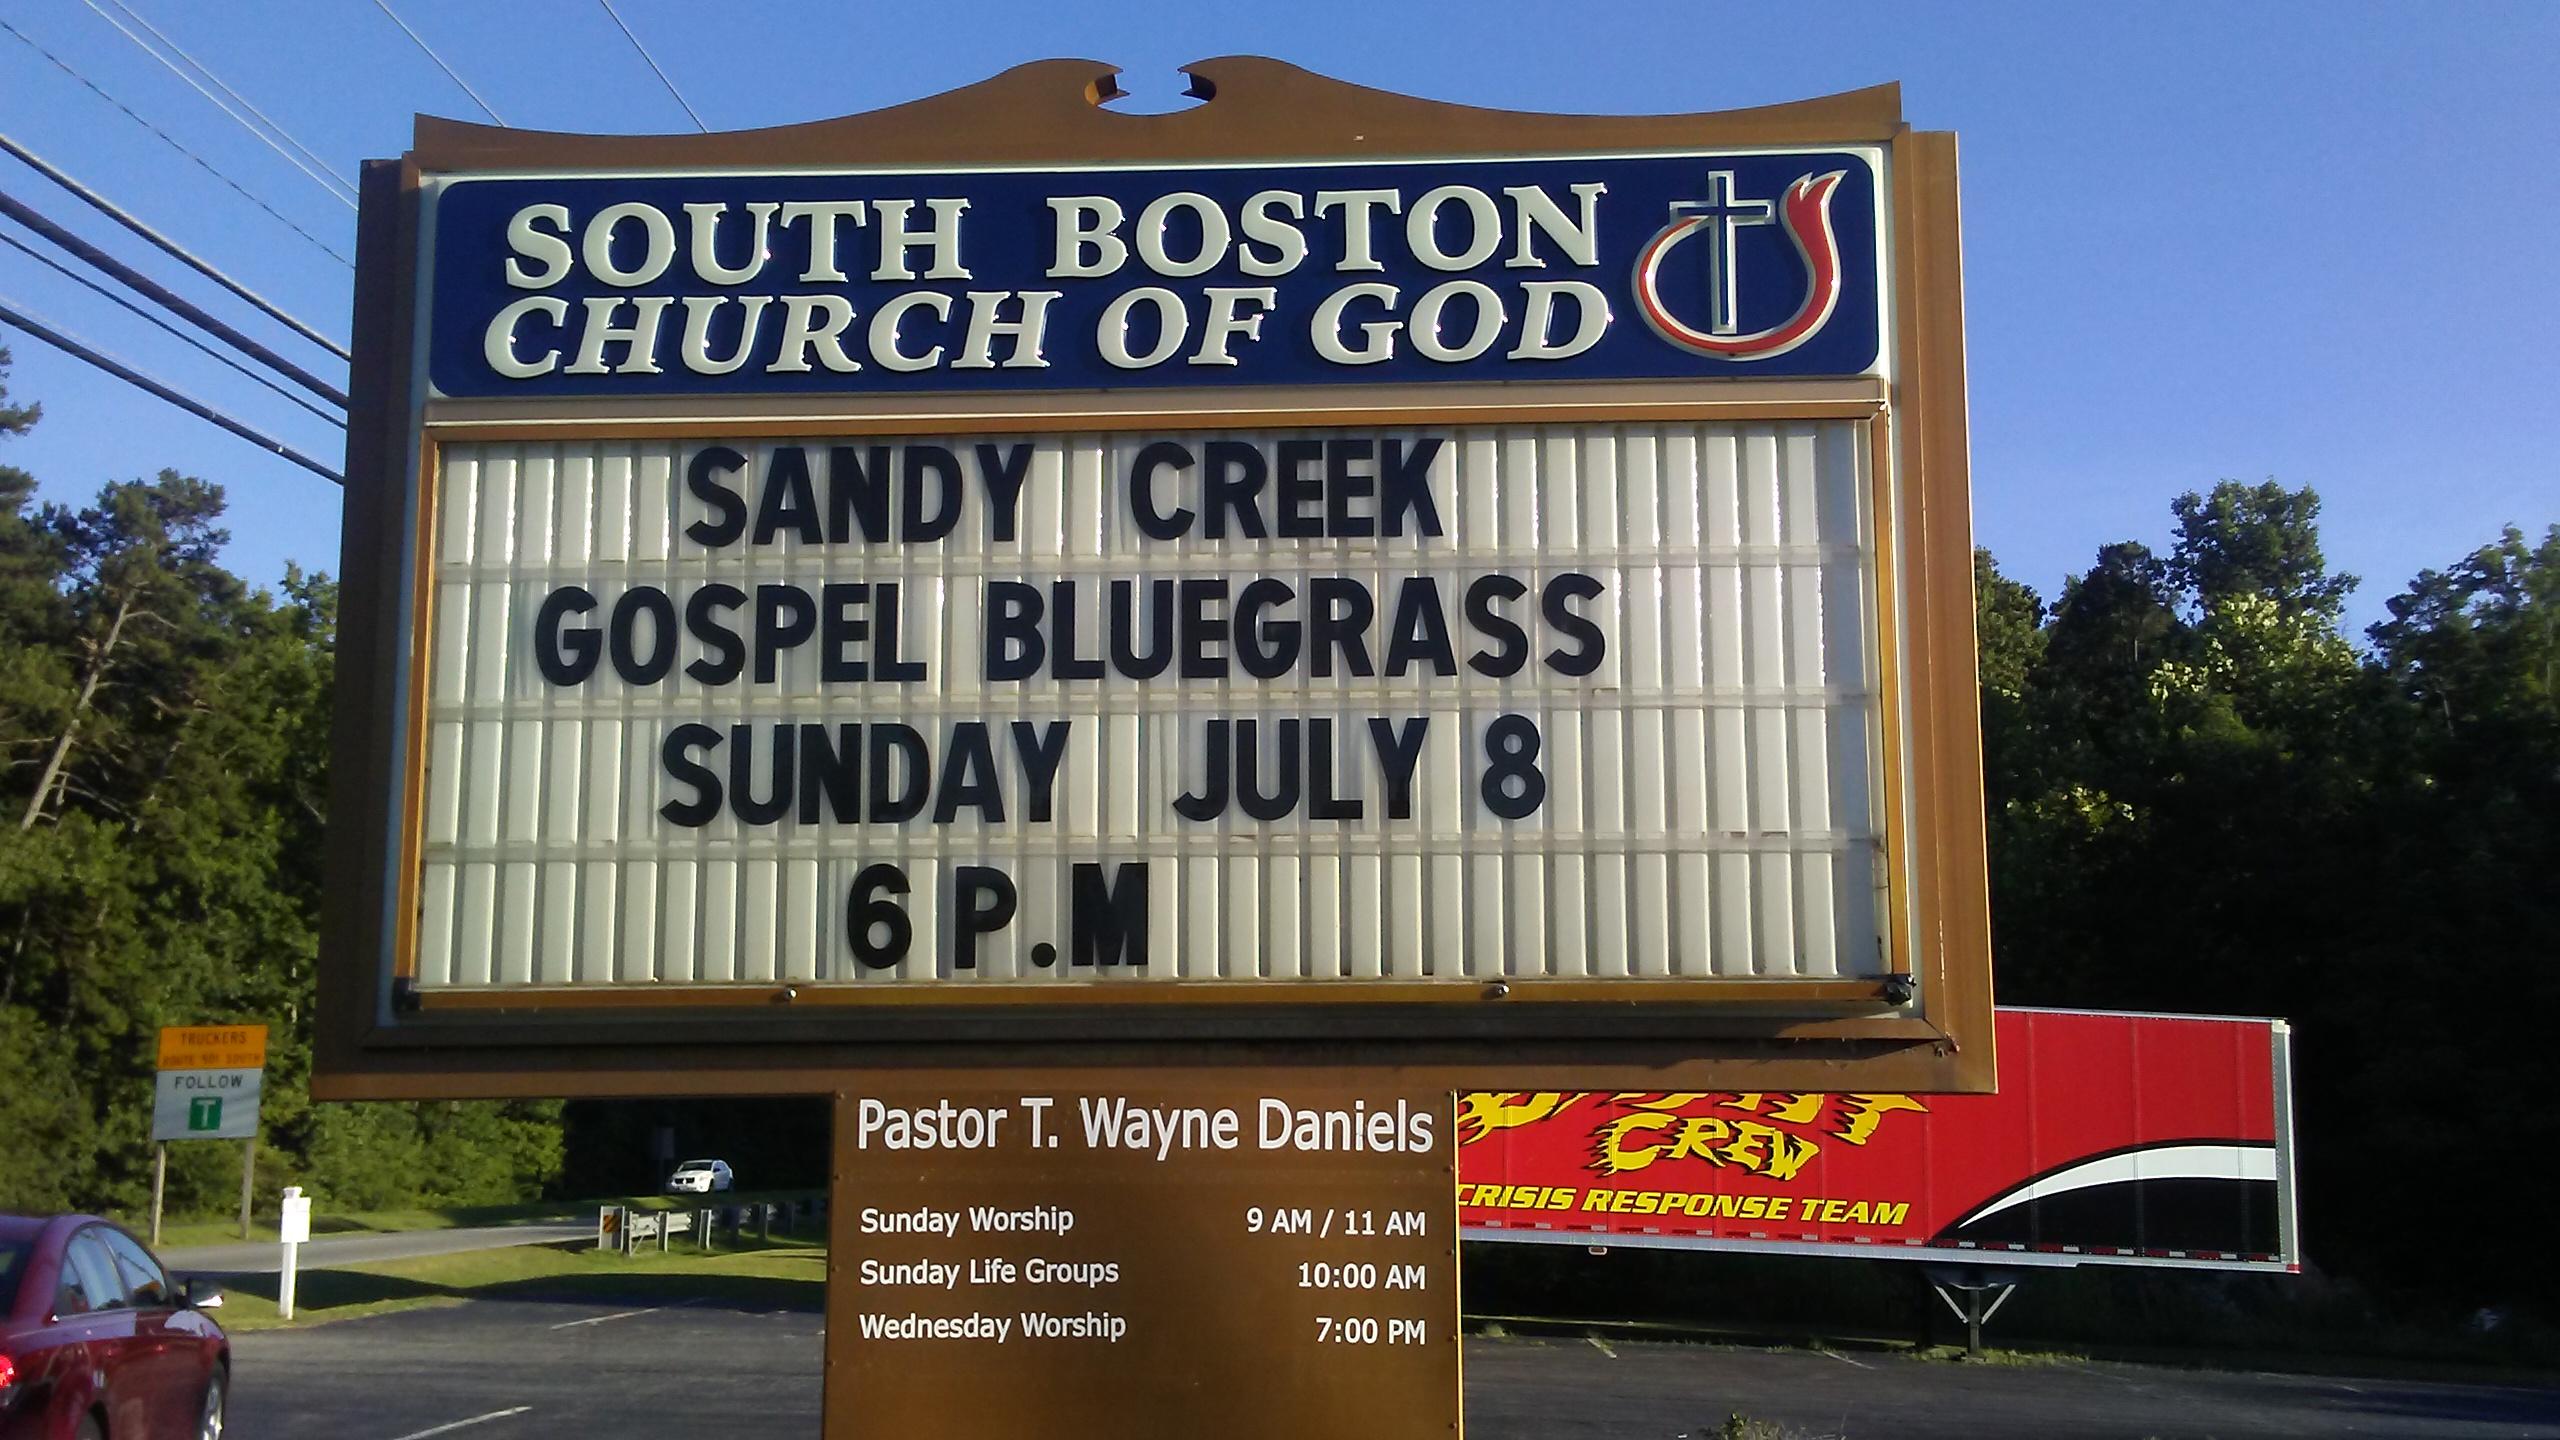 SandyCreekGospelBluegrass2018-07-08SouthBostonChurchOfGodVA.jpg